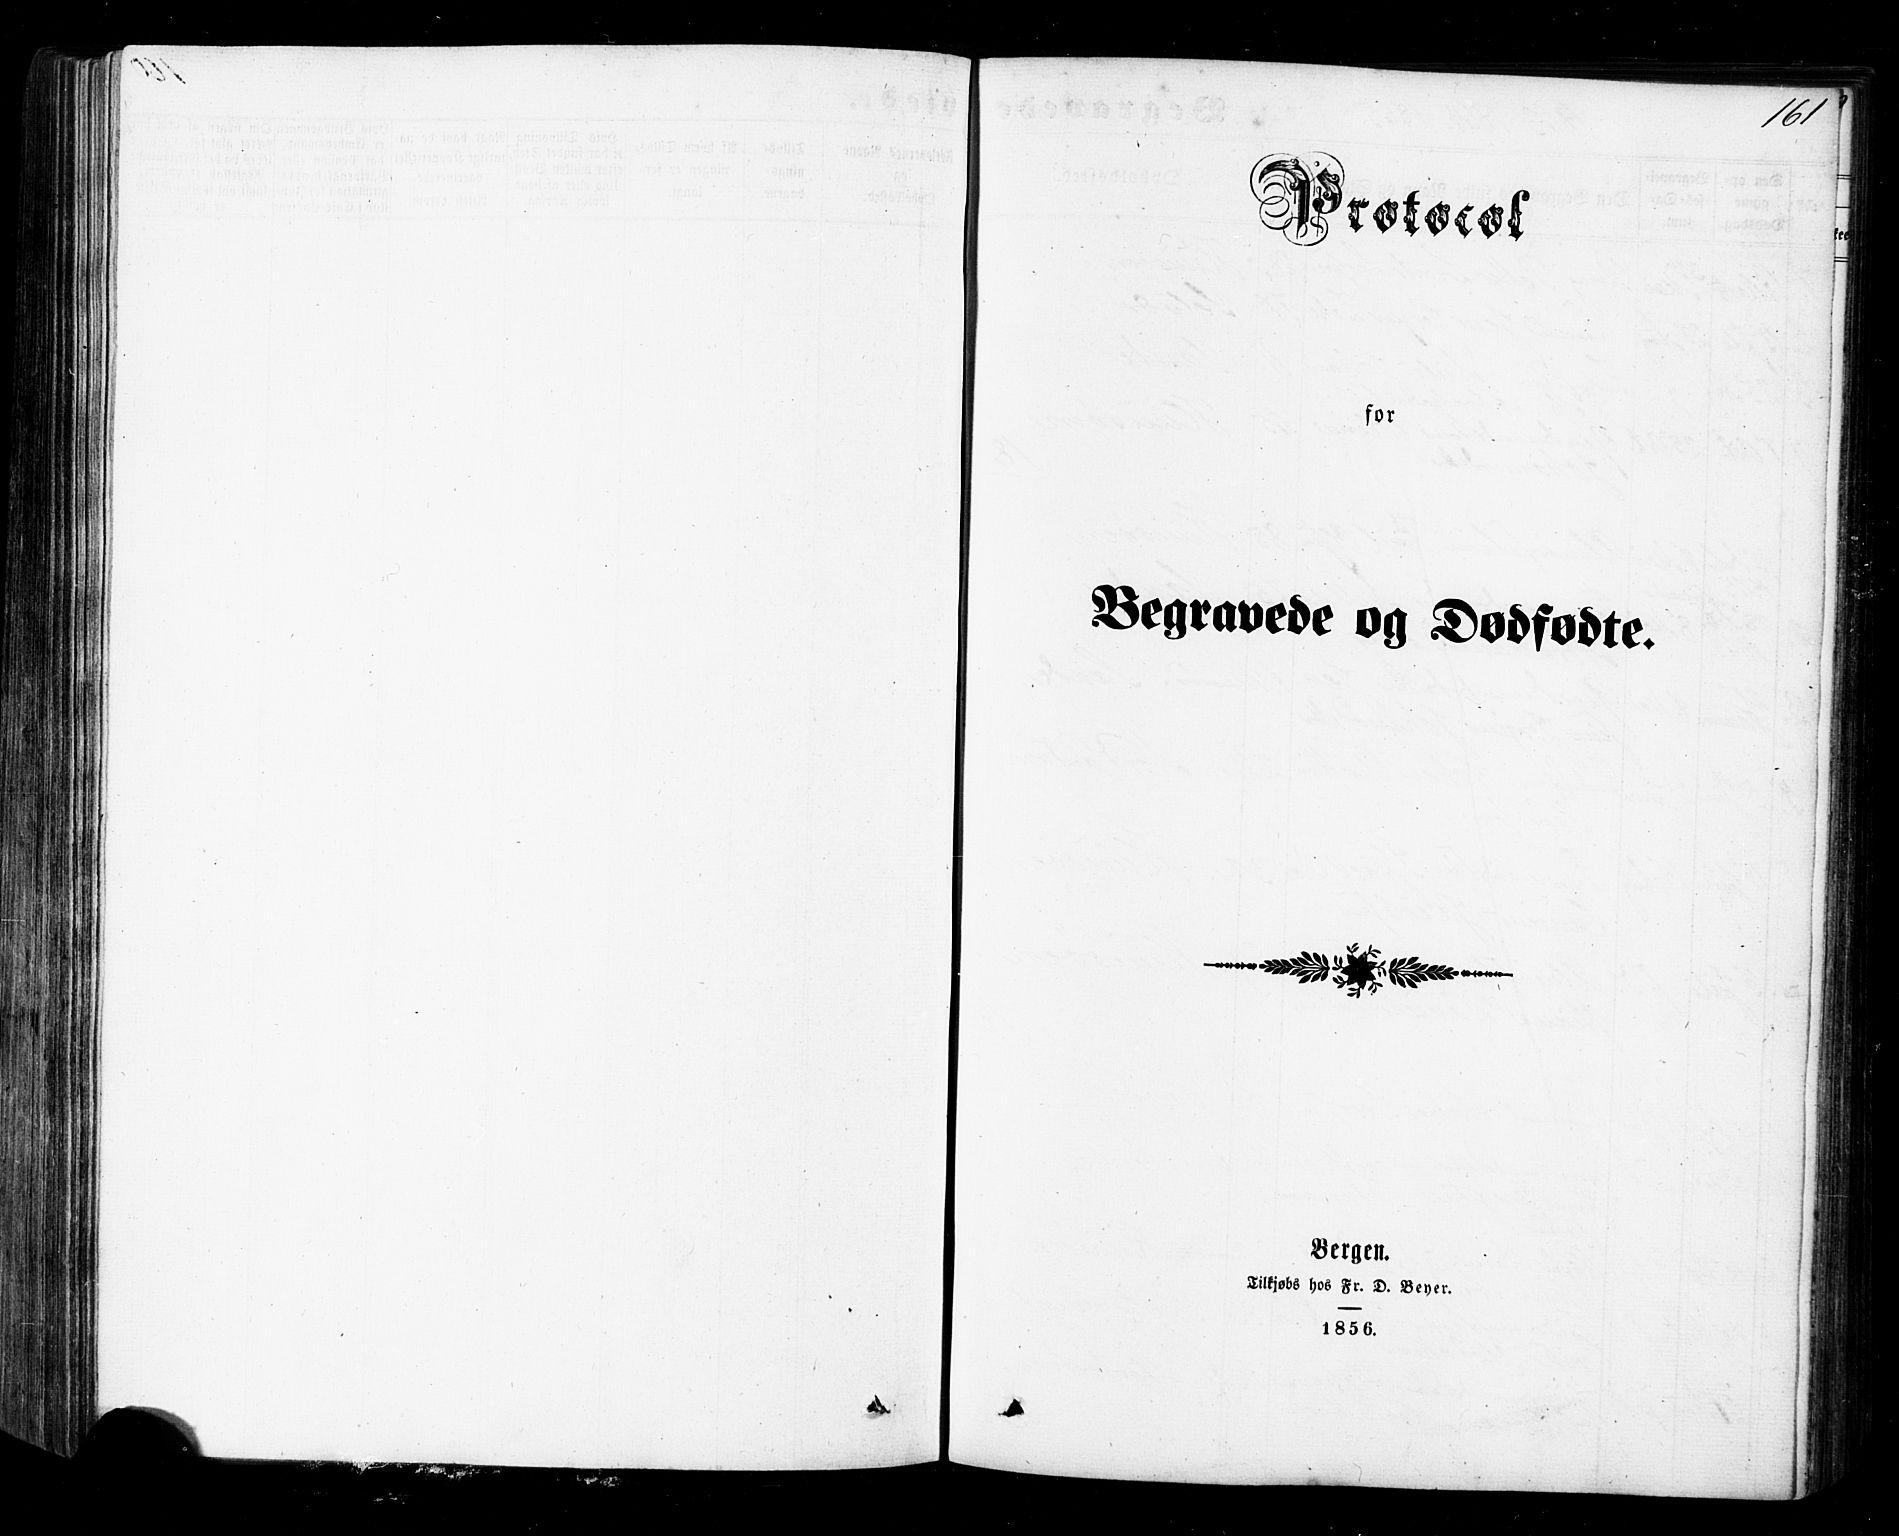 SAT, Ministerialprotokoller, klokkerbøker og fødselsregistre - Nordland, 840/L0579: Ministerialbok nr. 840A01, 1863-1887, s. 161